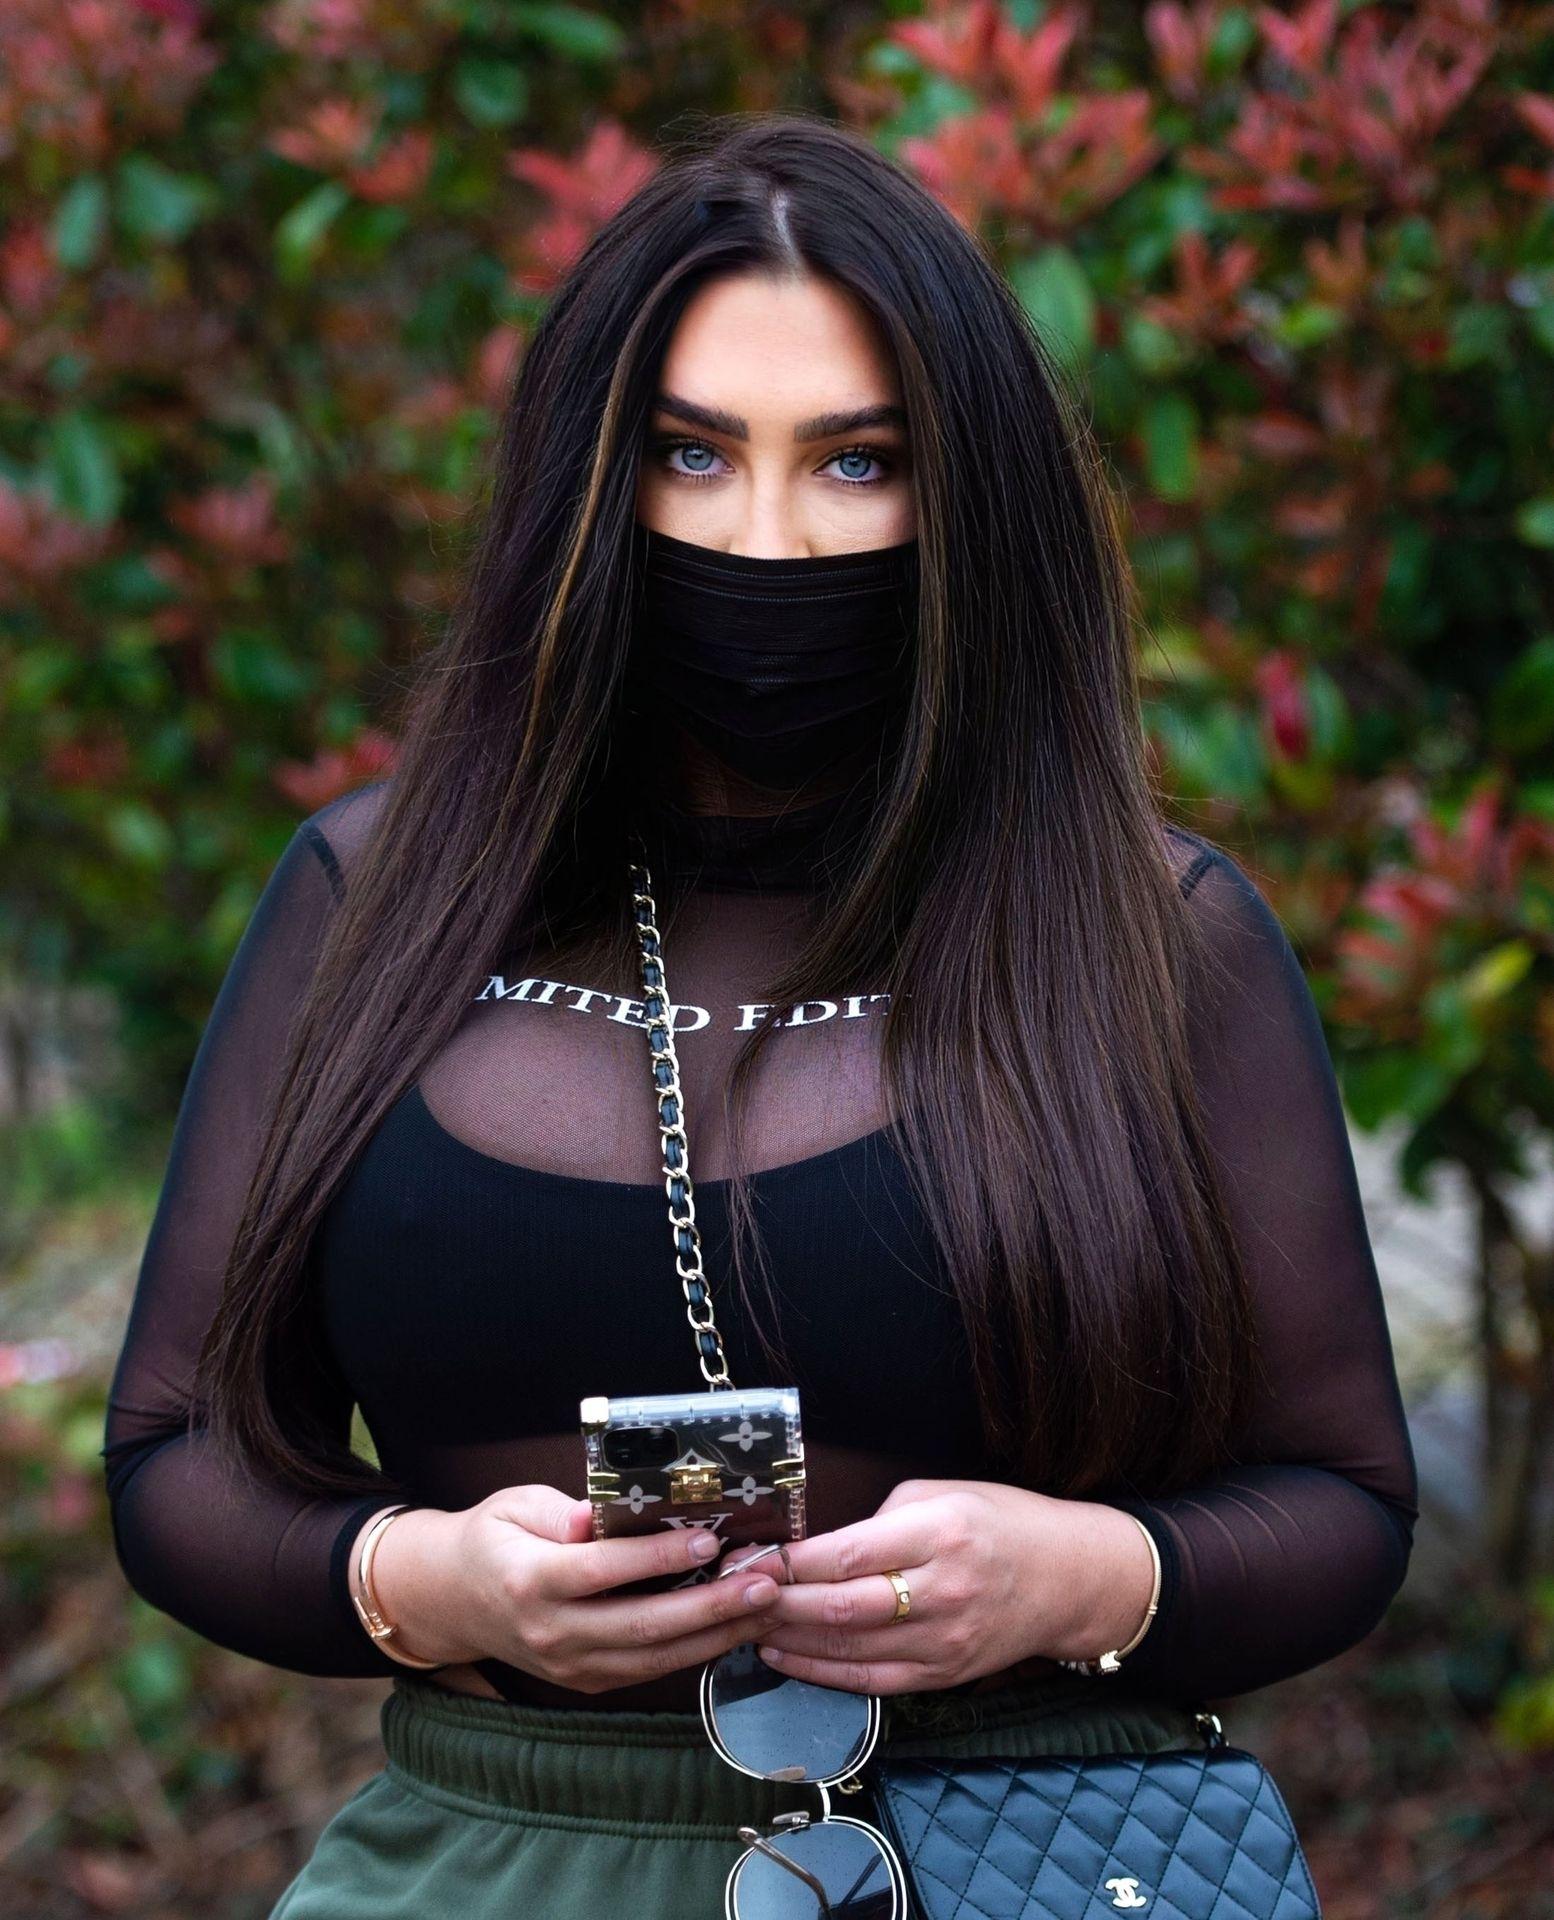 Lauren Goodger Wears A Facial Mask To Protect Against Coronavirus 0001